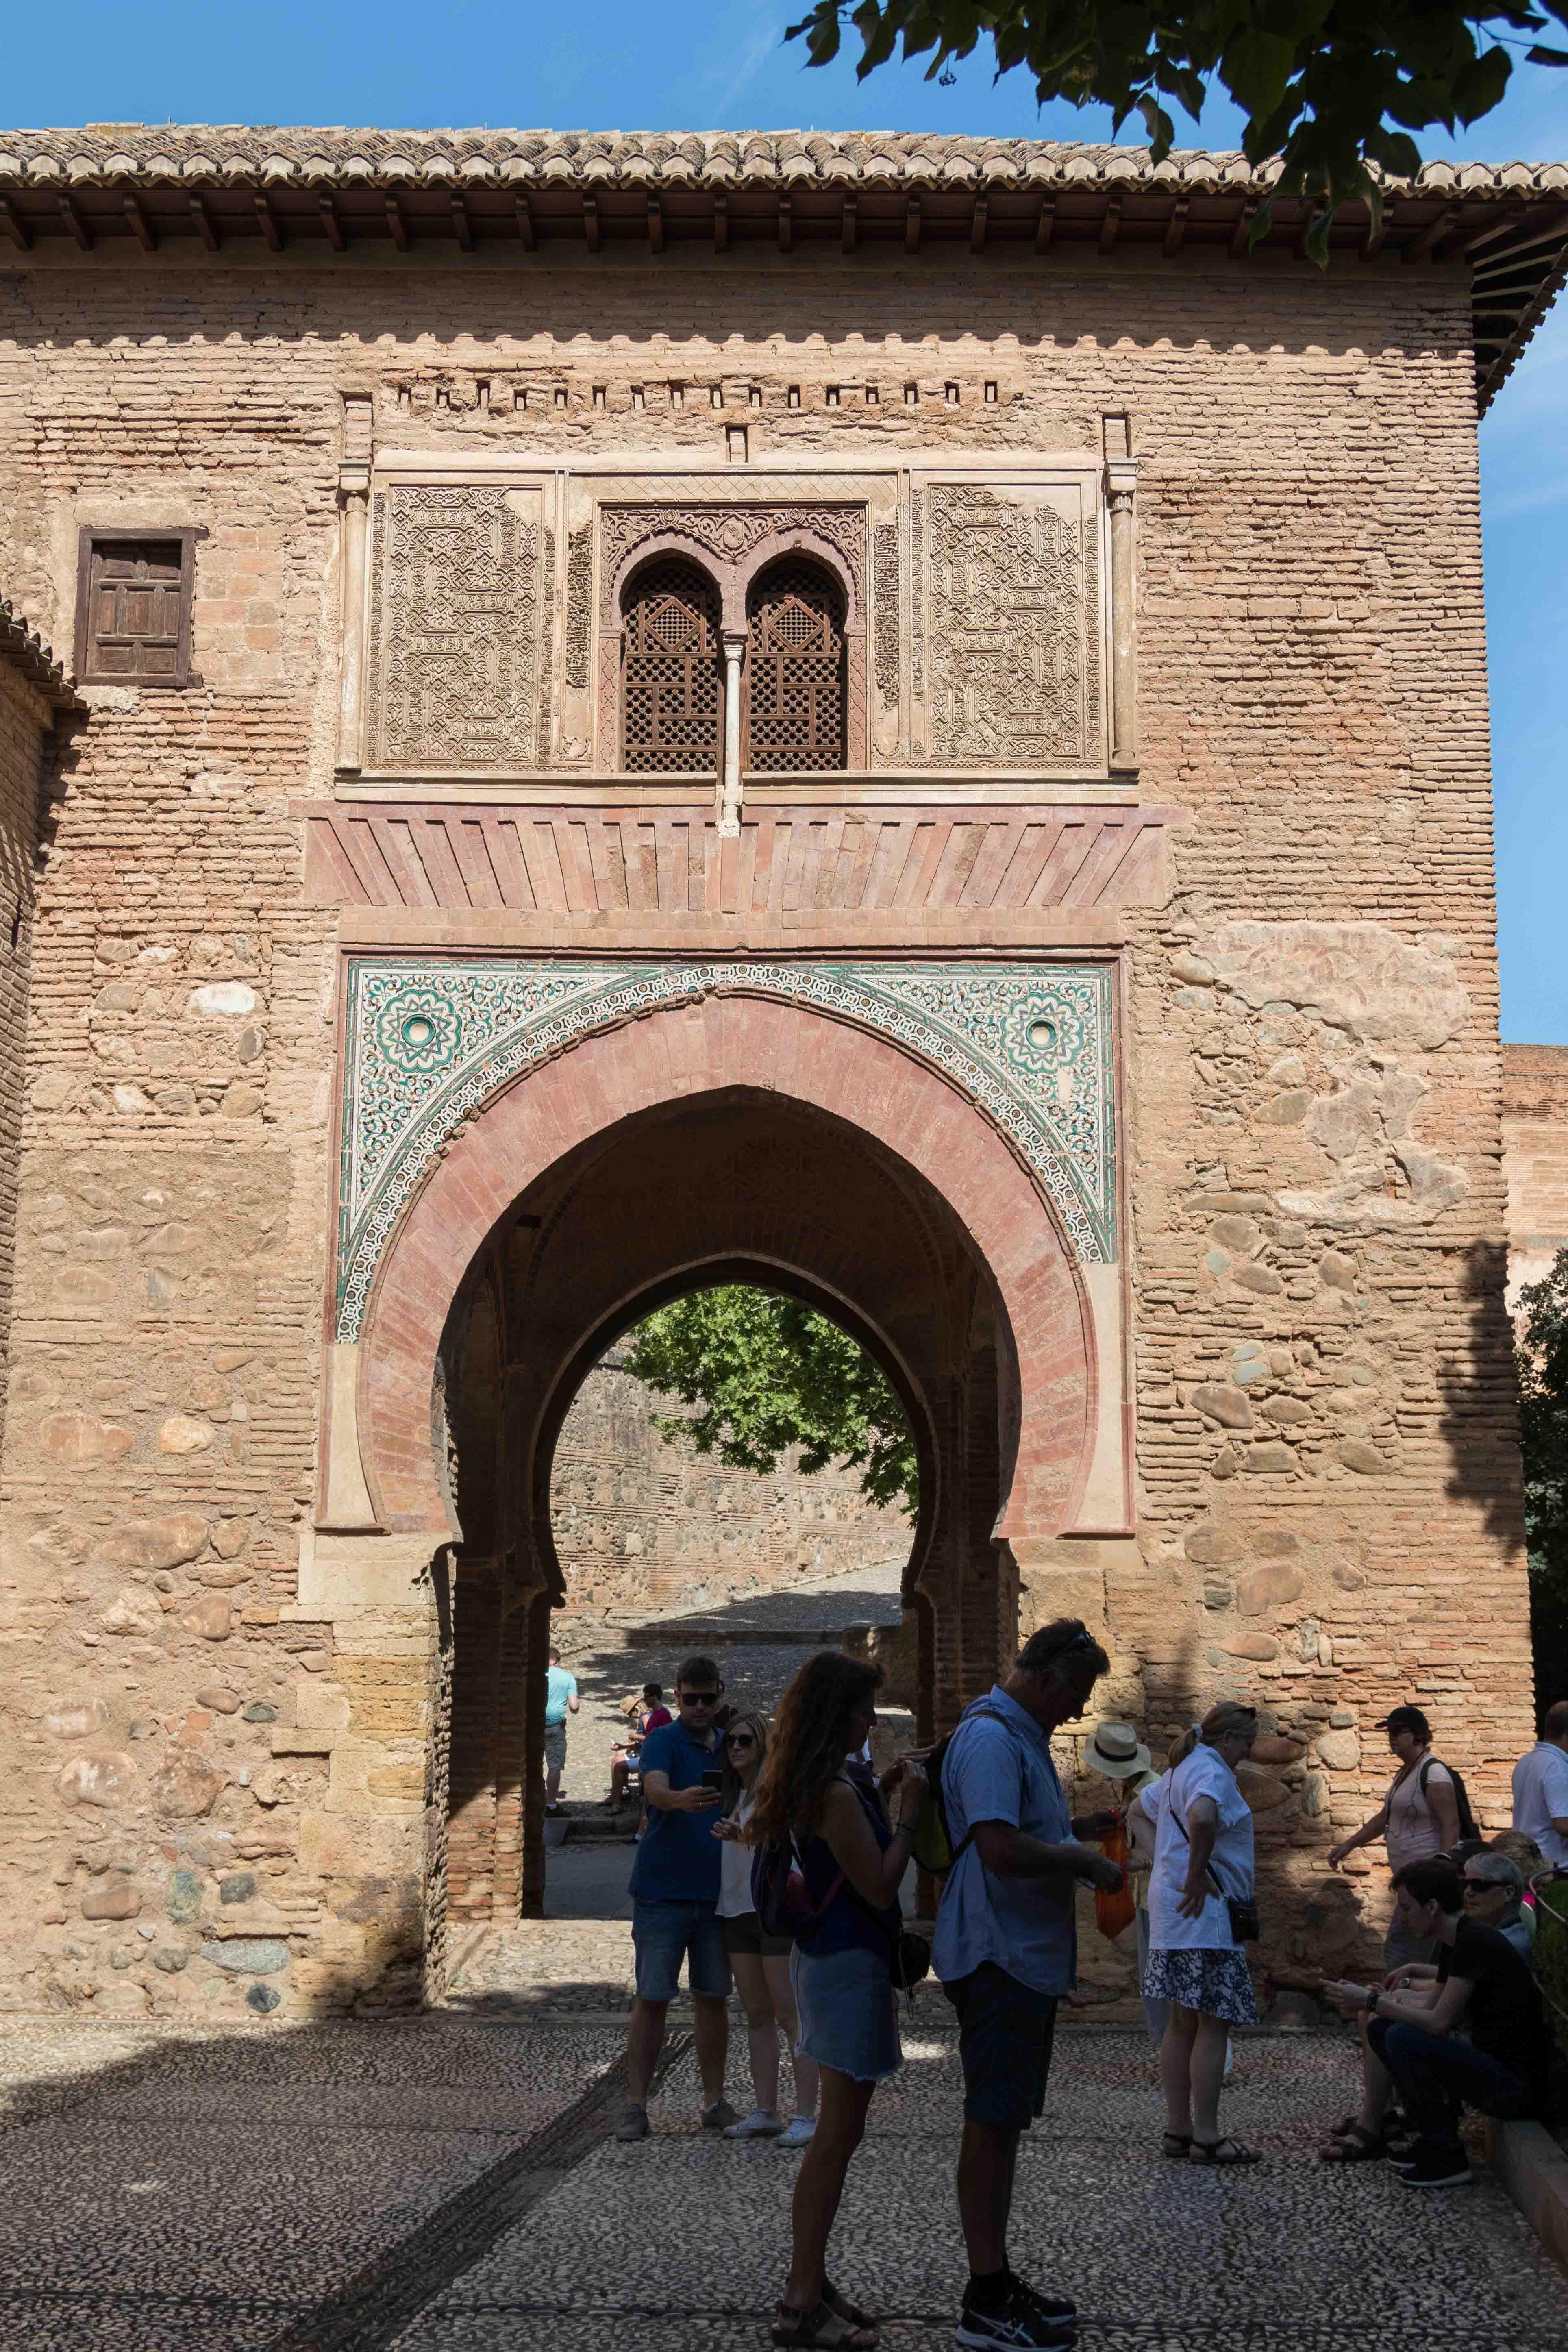 Mediterranean Cruise: Alhambra Palace, Granada, Spain | https://www.roseclearfield.com